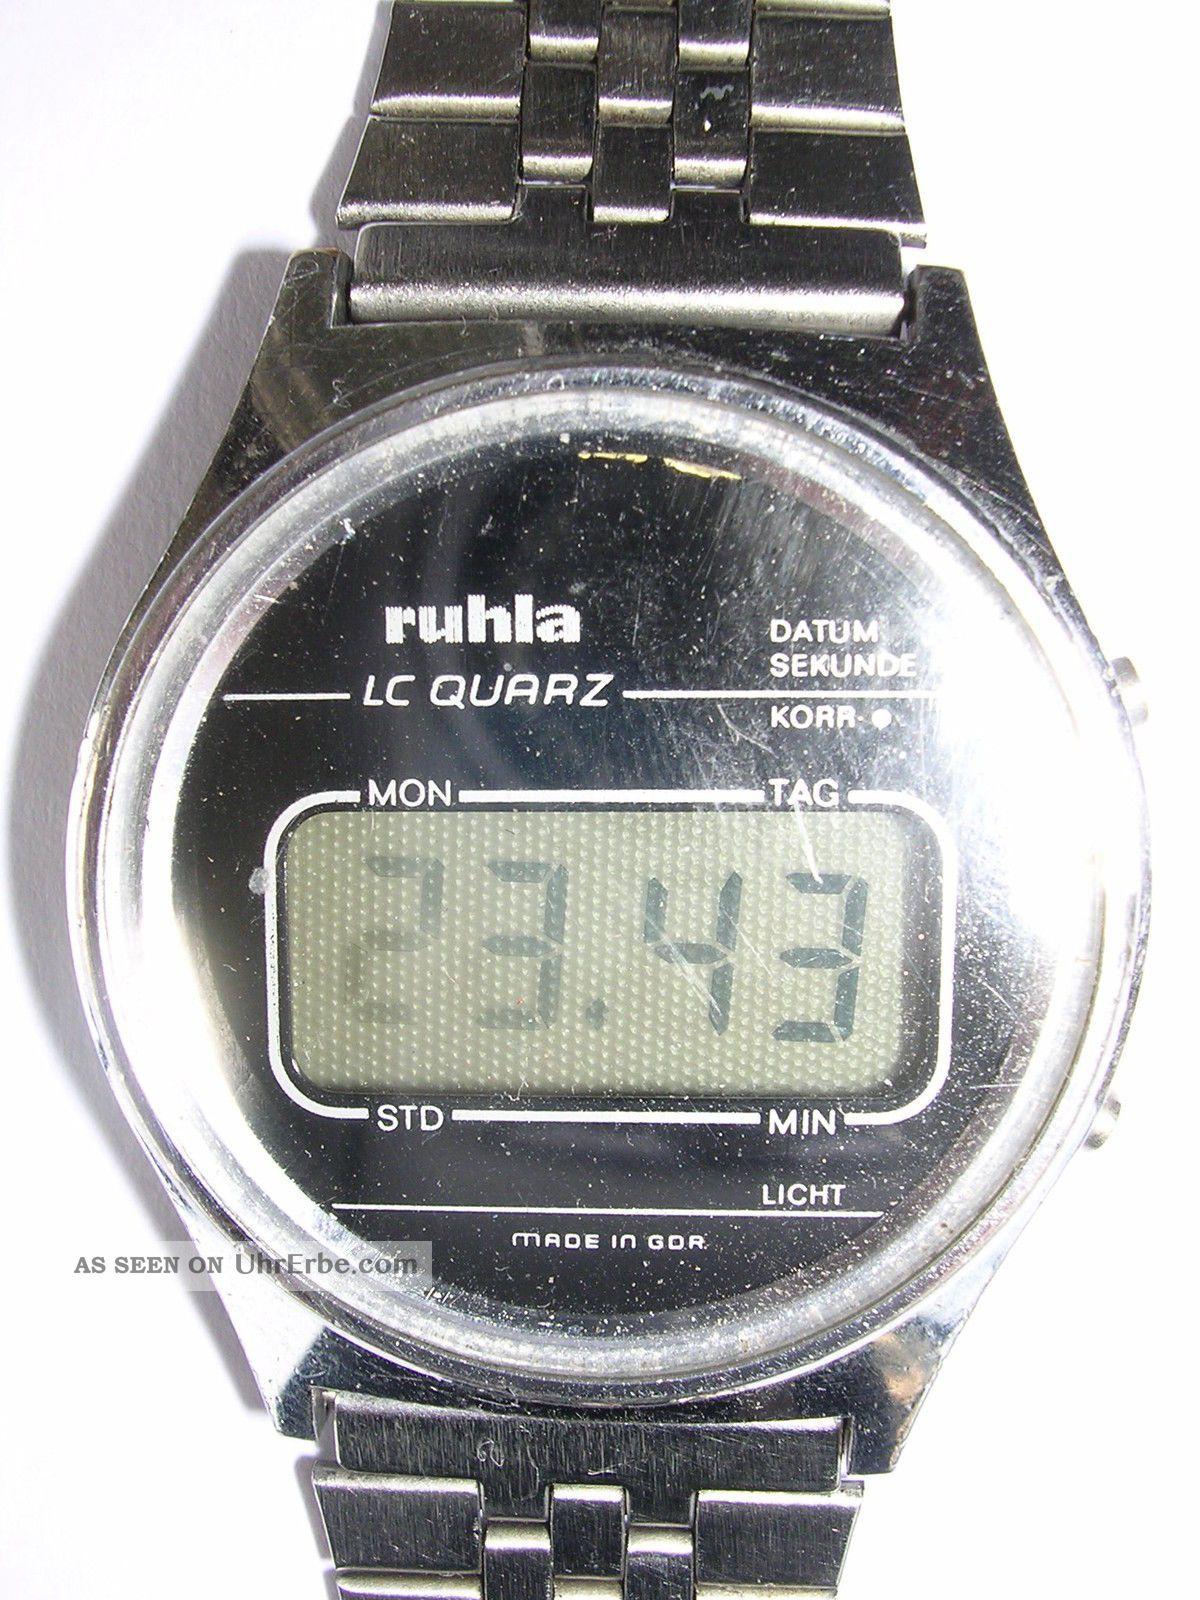 Für Sammler Lcd Retro Herrenruhr Ruhla Digital Hau Aus Nachlass Armbanduhren Bild